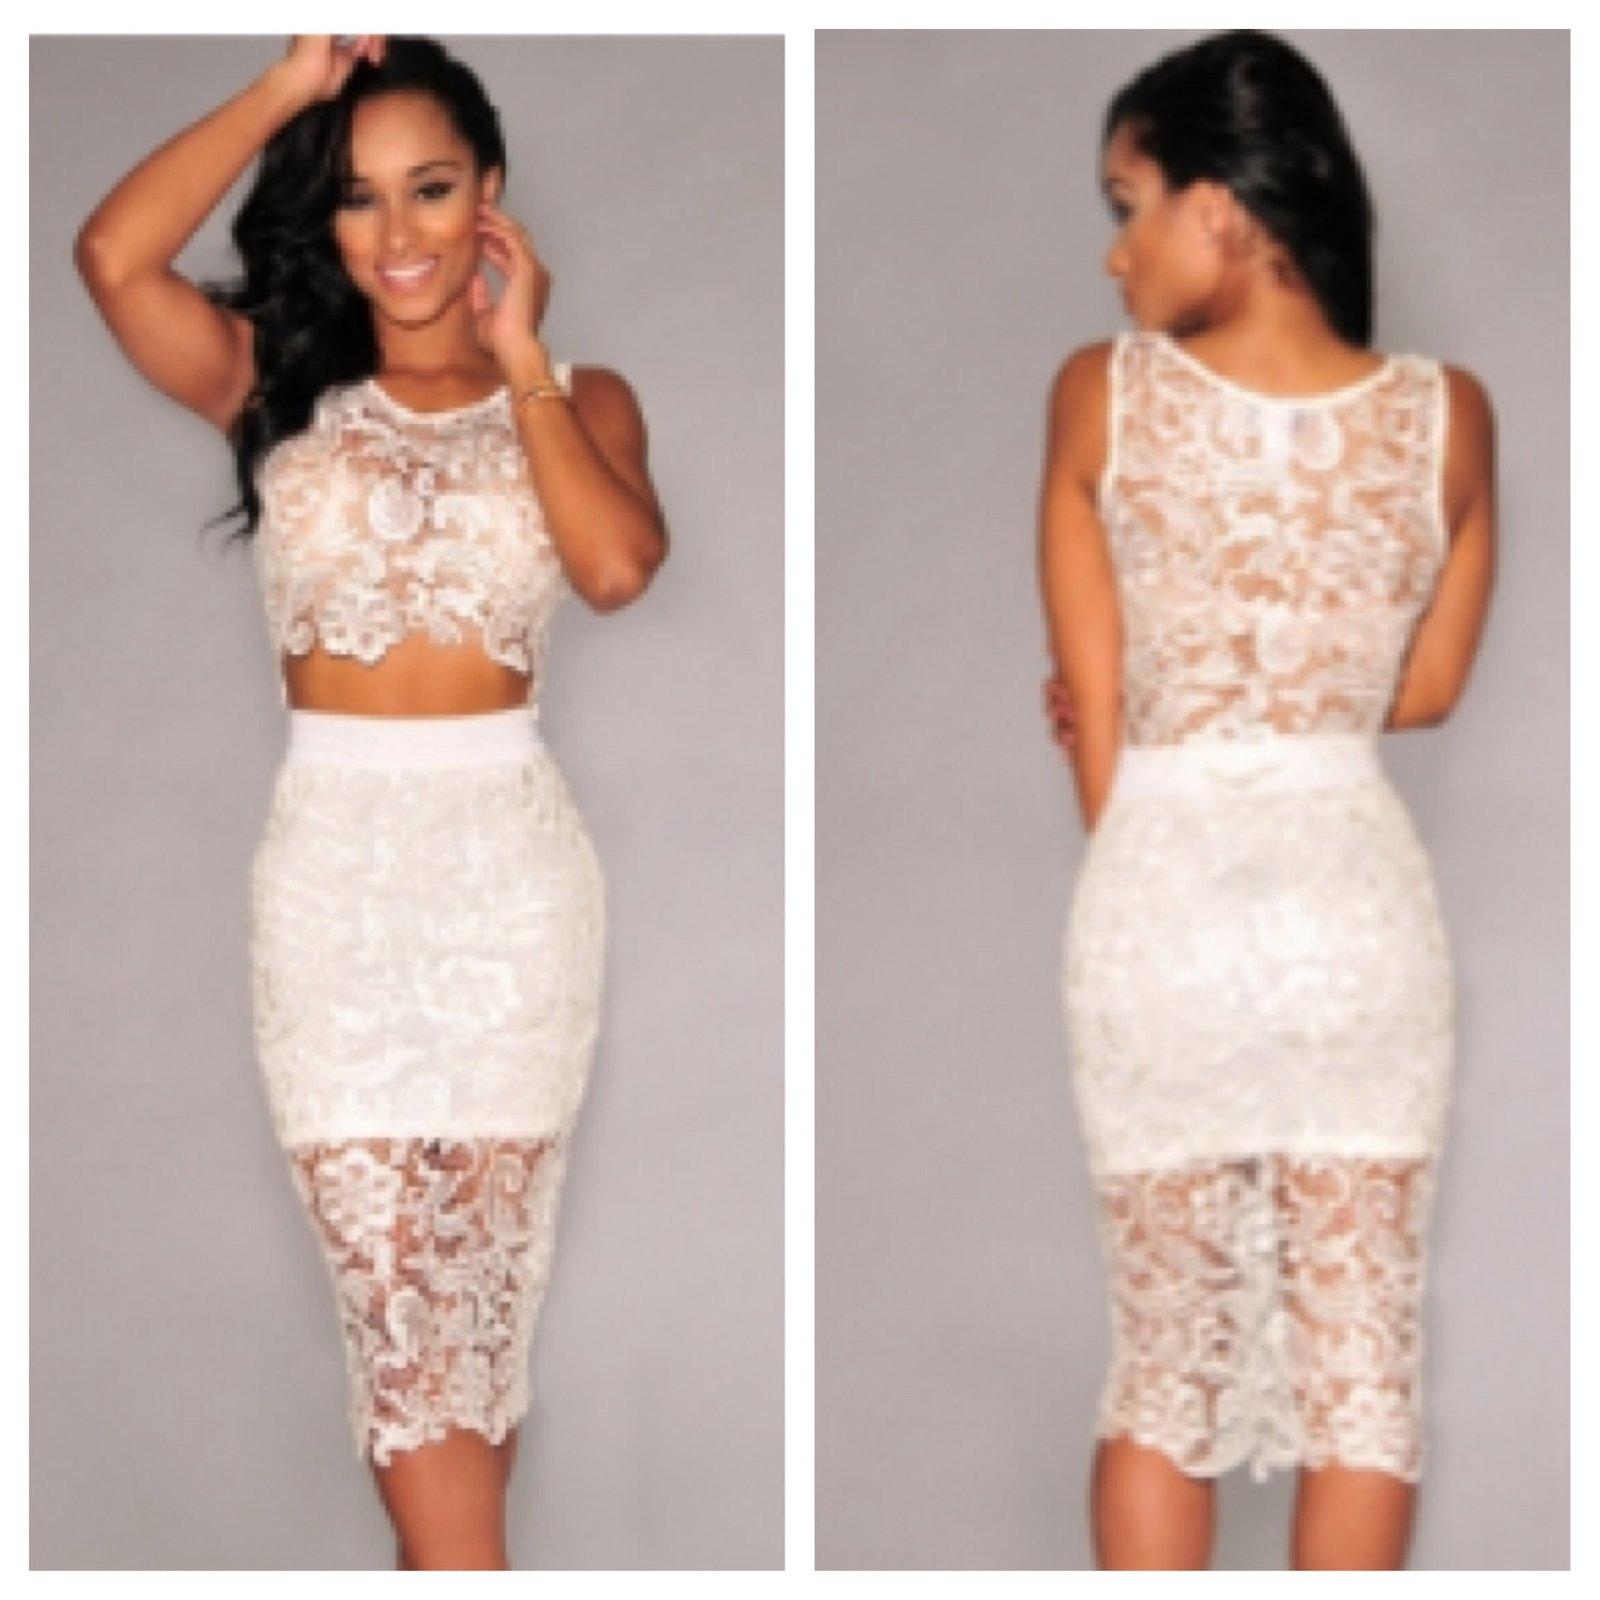 73e1d0e8fe Sleeveless lace skirt and top eklektik style jpg 1000x1000 Lace skirt and  top